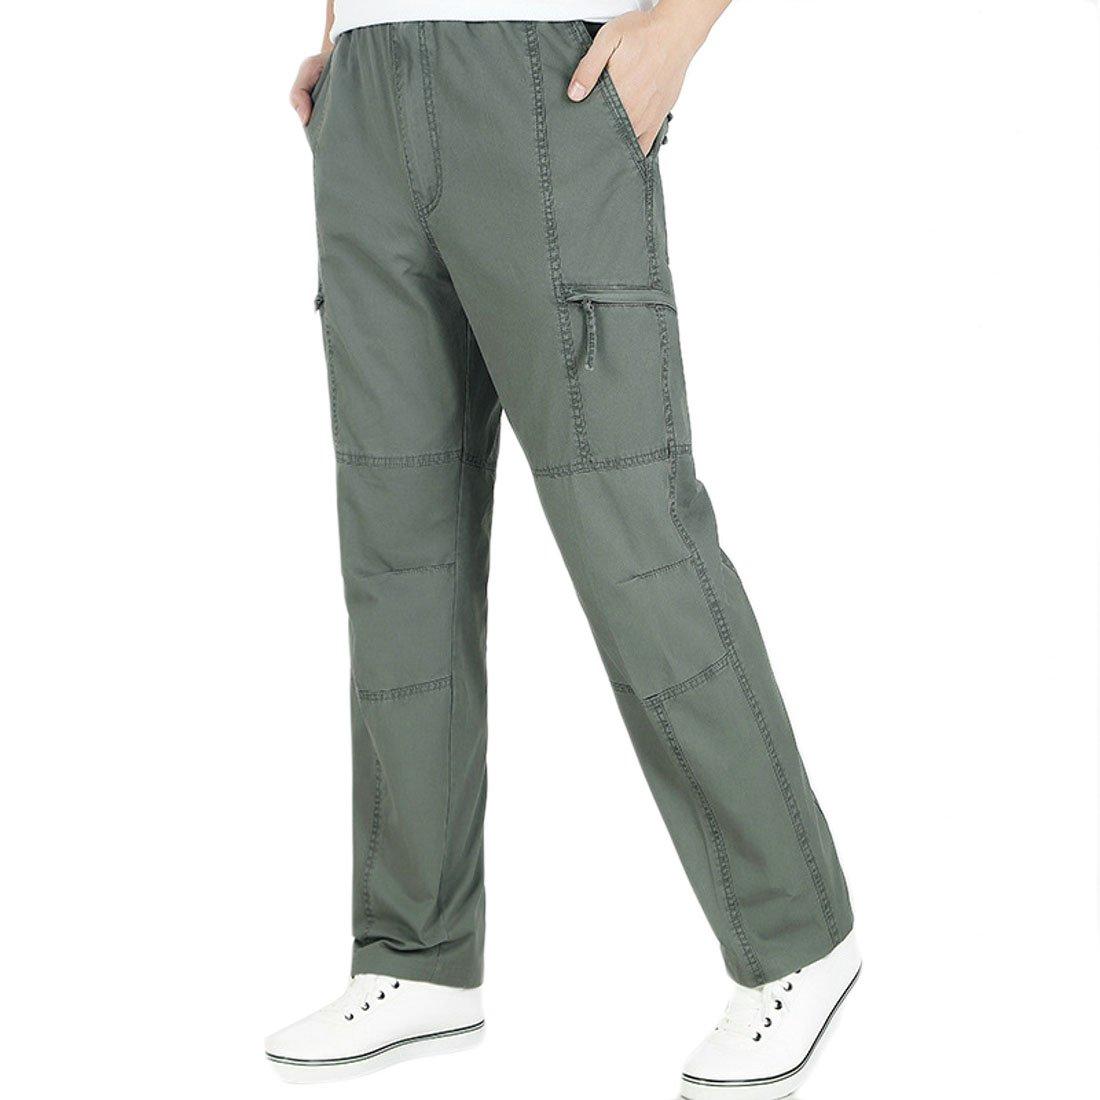 Jotebriyo Mens Multi-Pockets Plus Size Zip Up Casual Cotton Big /& Tall Rugged Cargo Pants